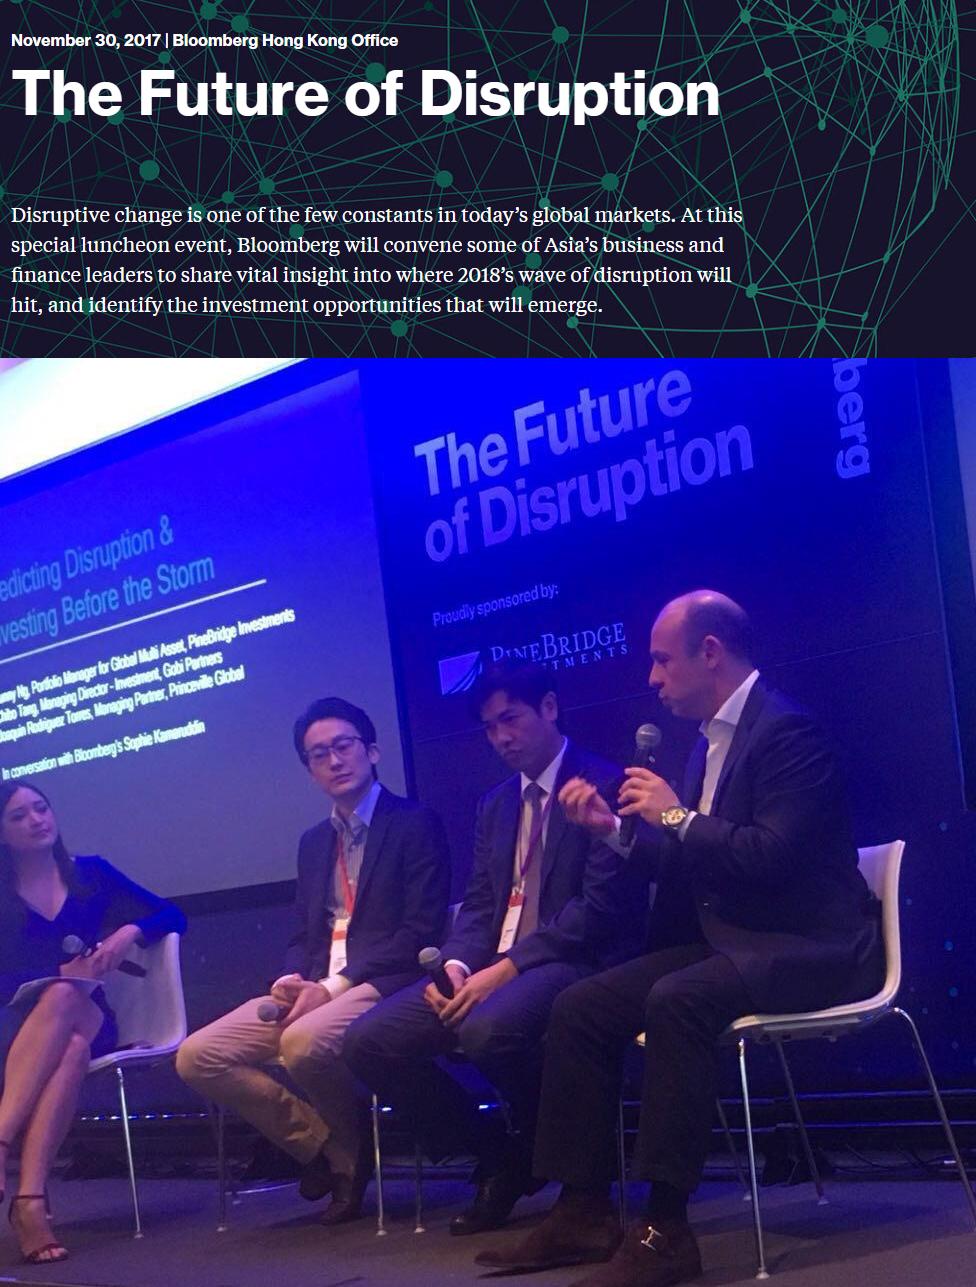 2017.11.30 - The Future of Disruption.jpg